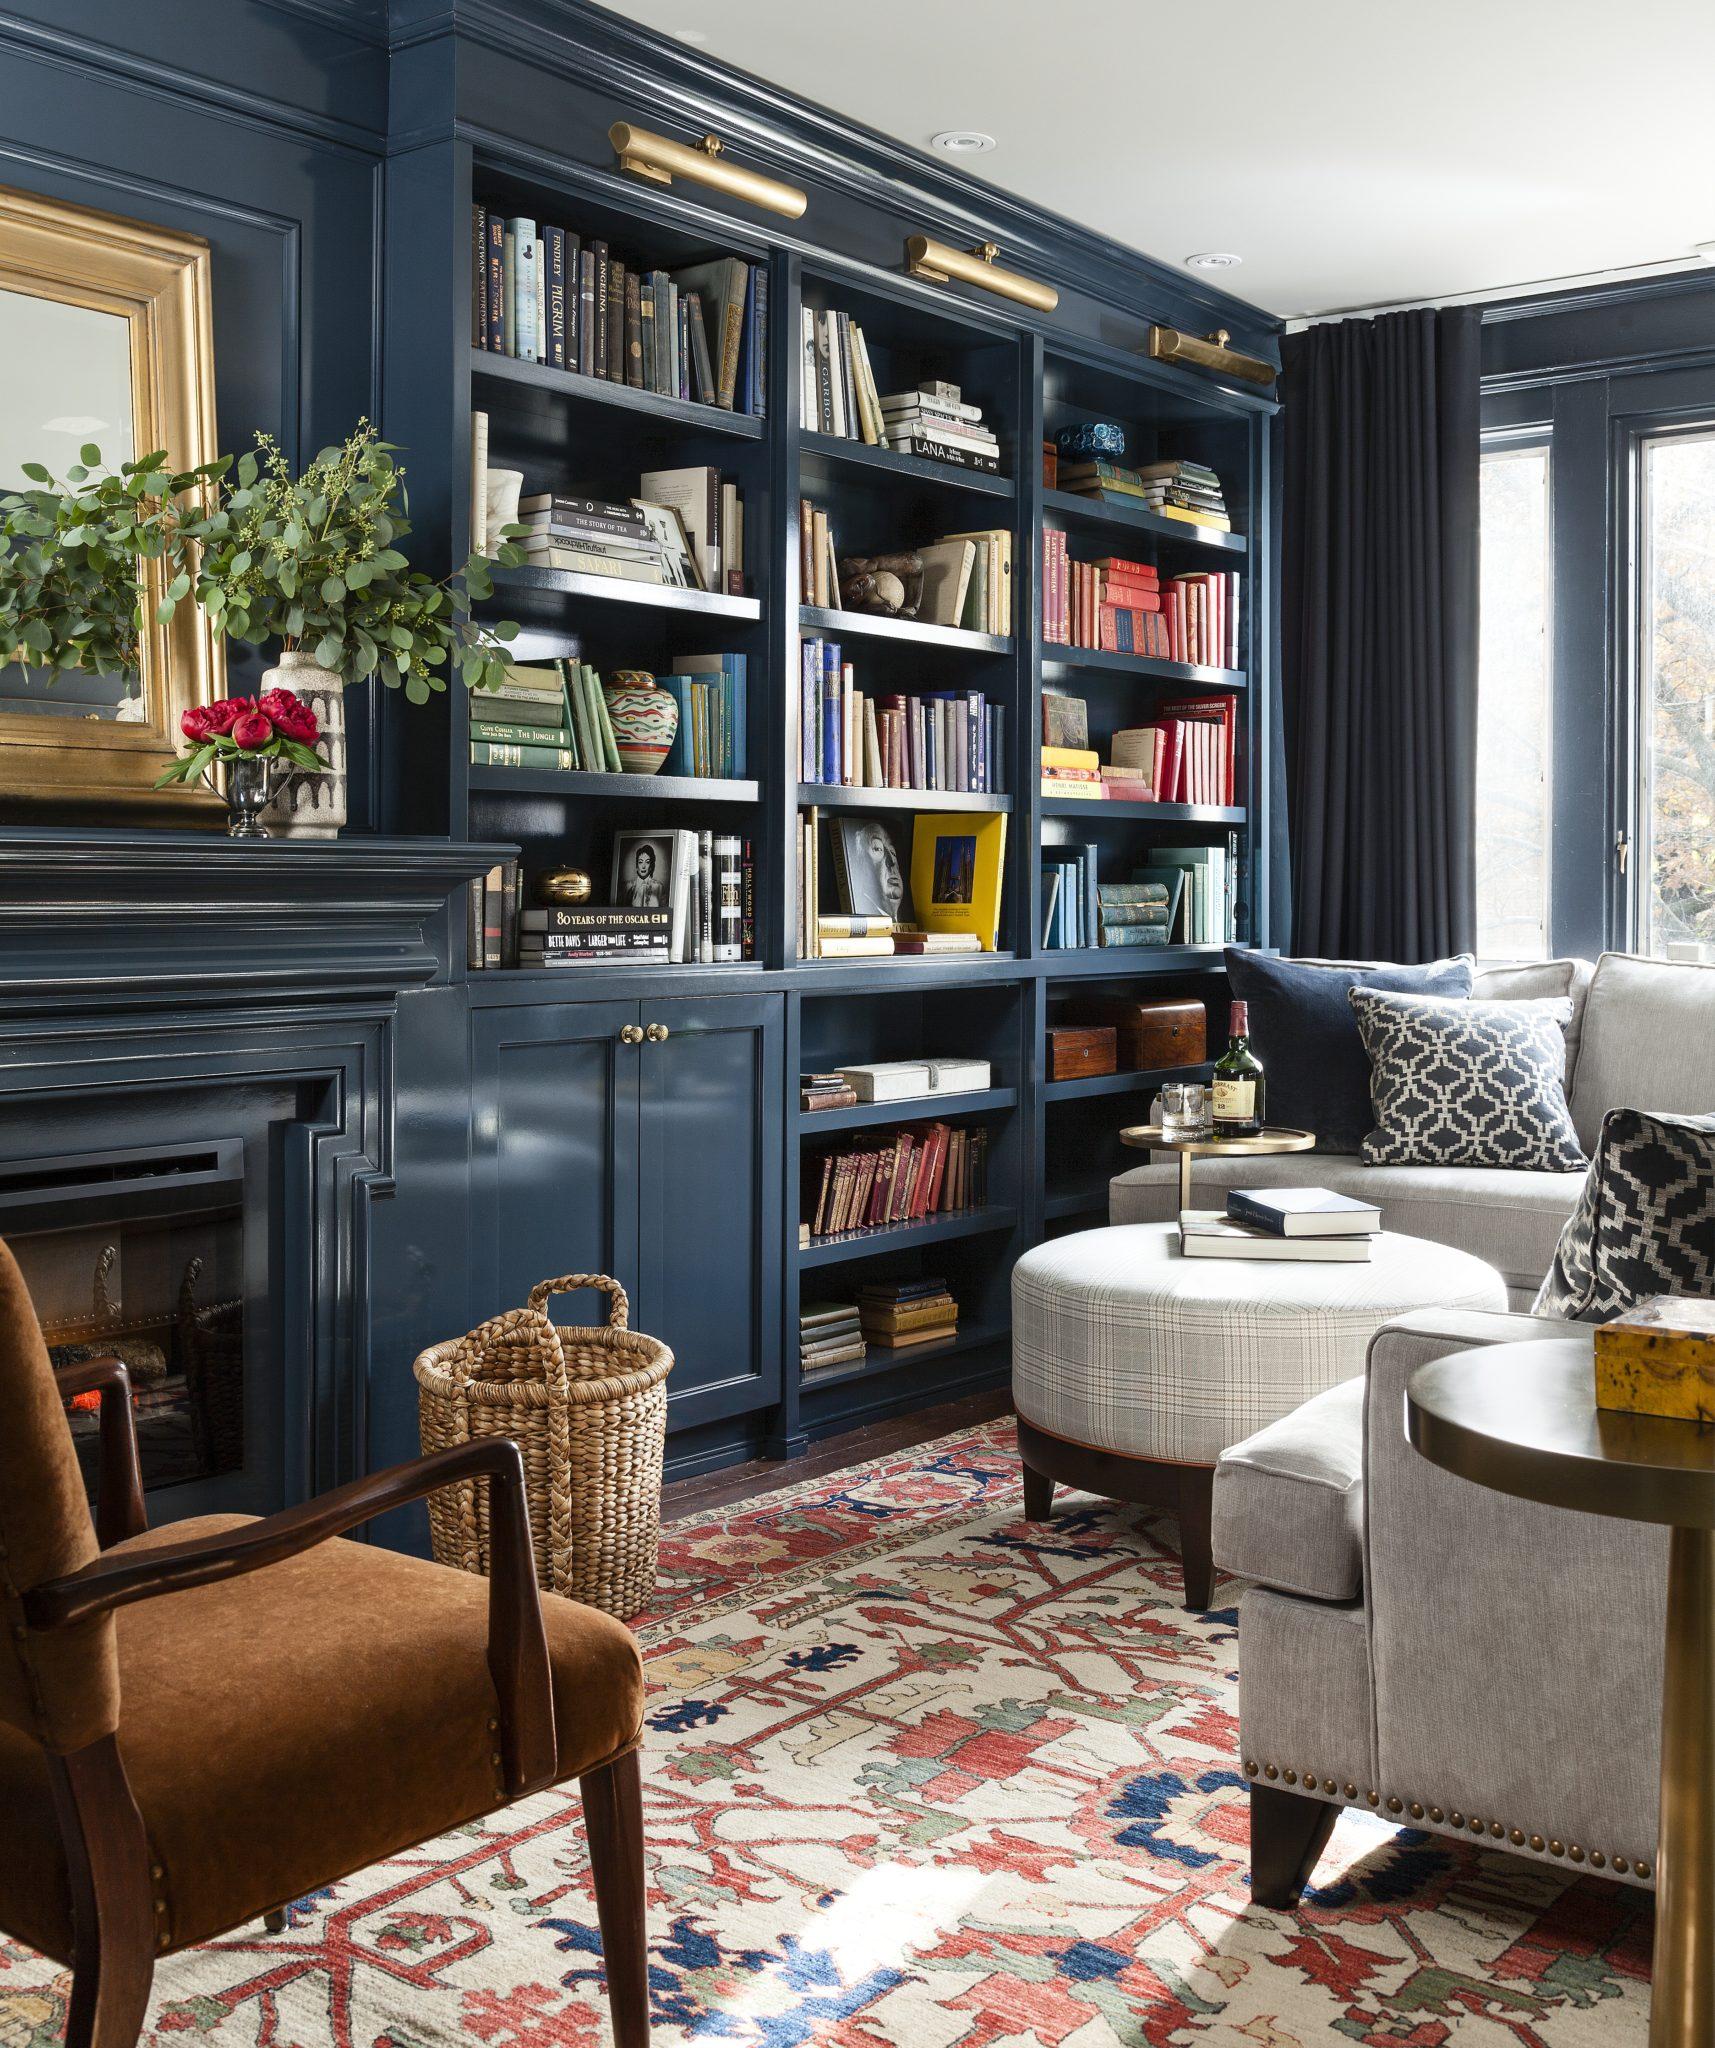 Interior design by Meredith Heron Design